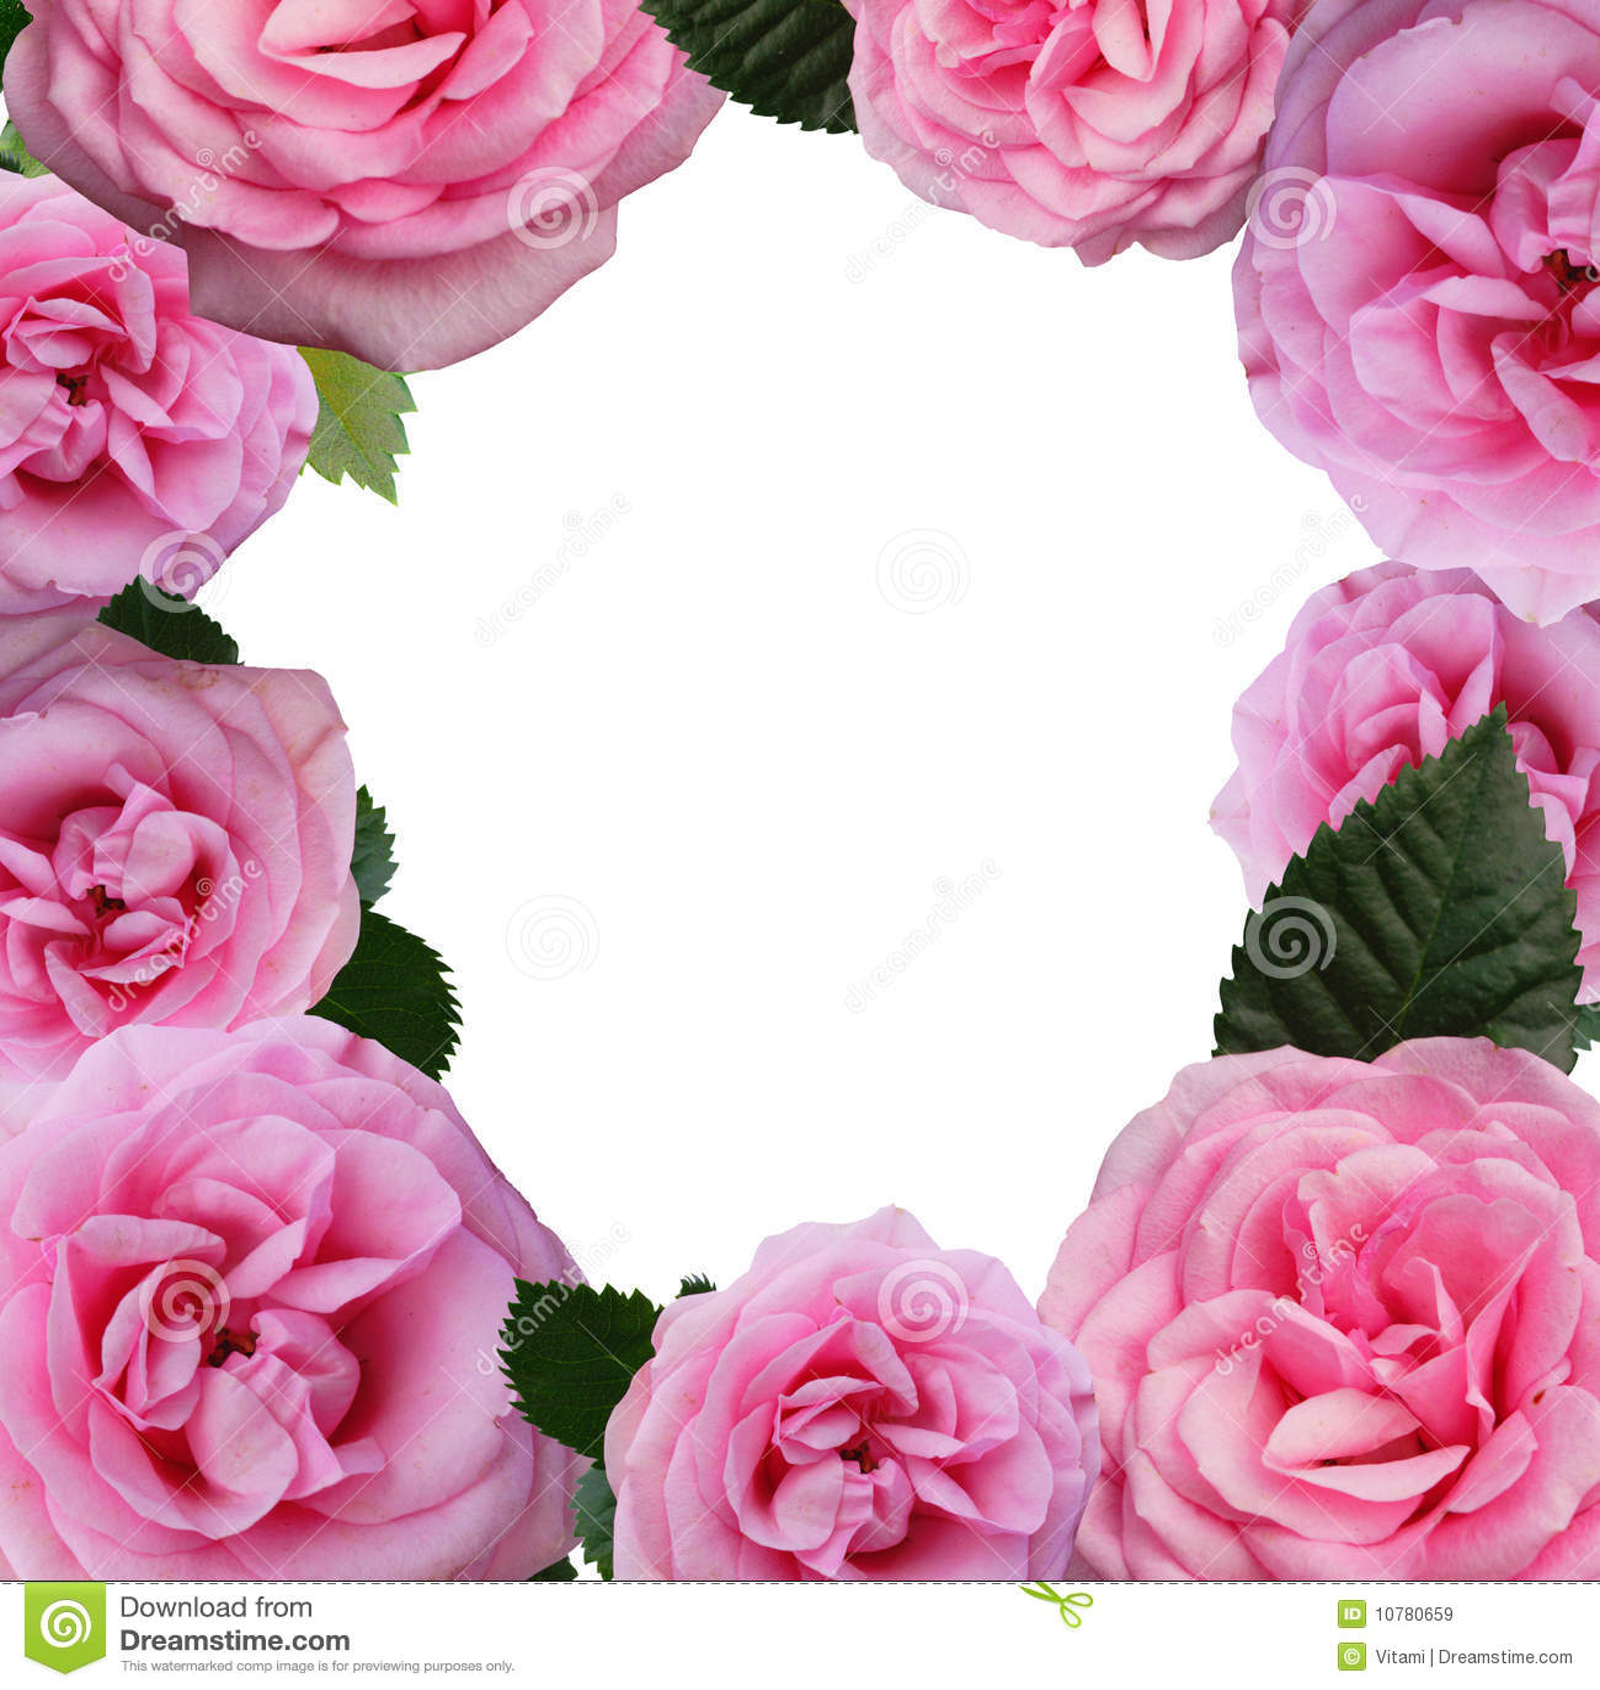 Bloemen frame - rozen